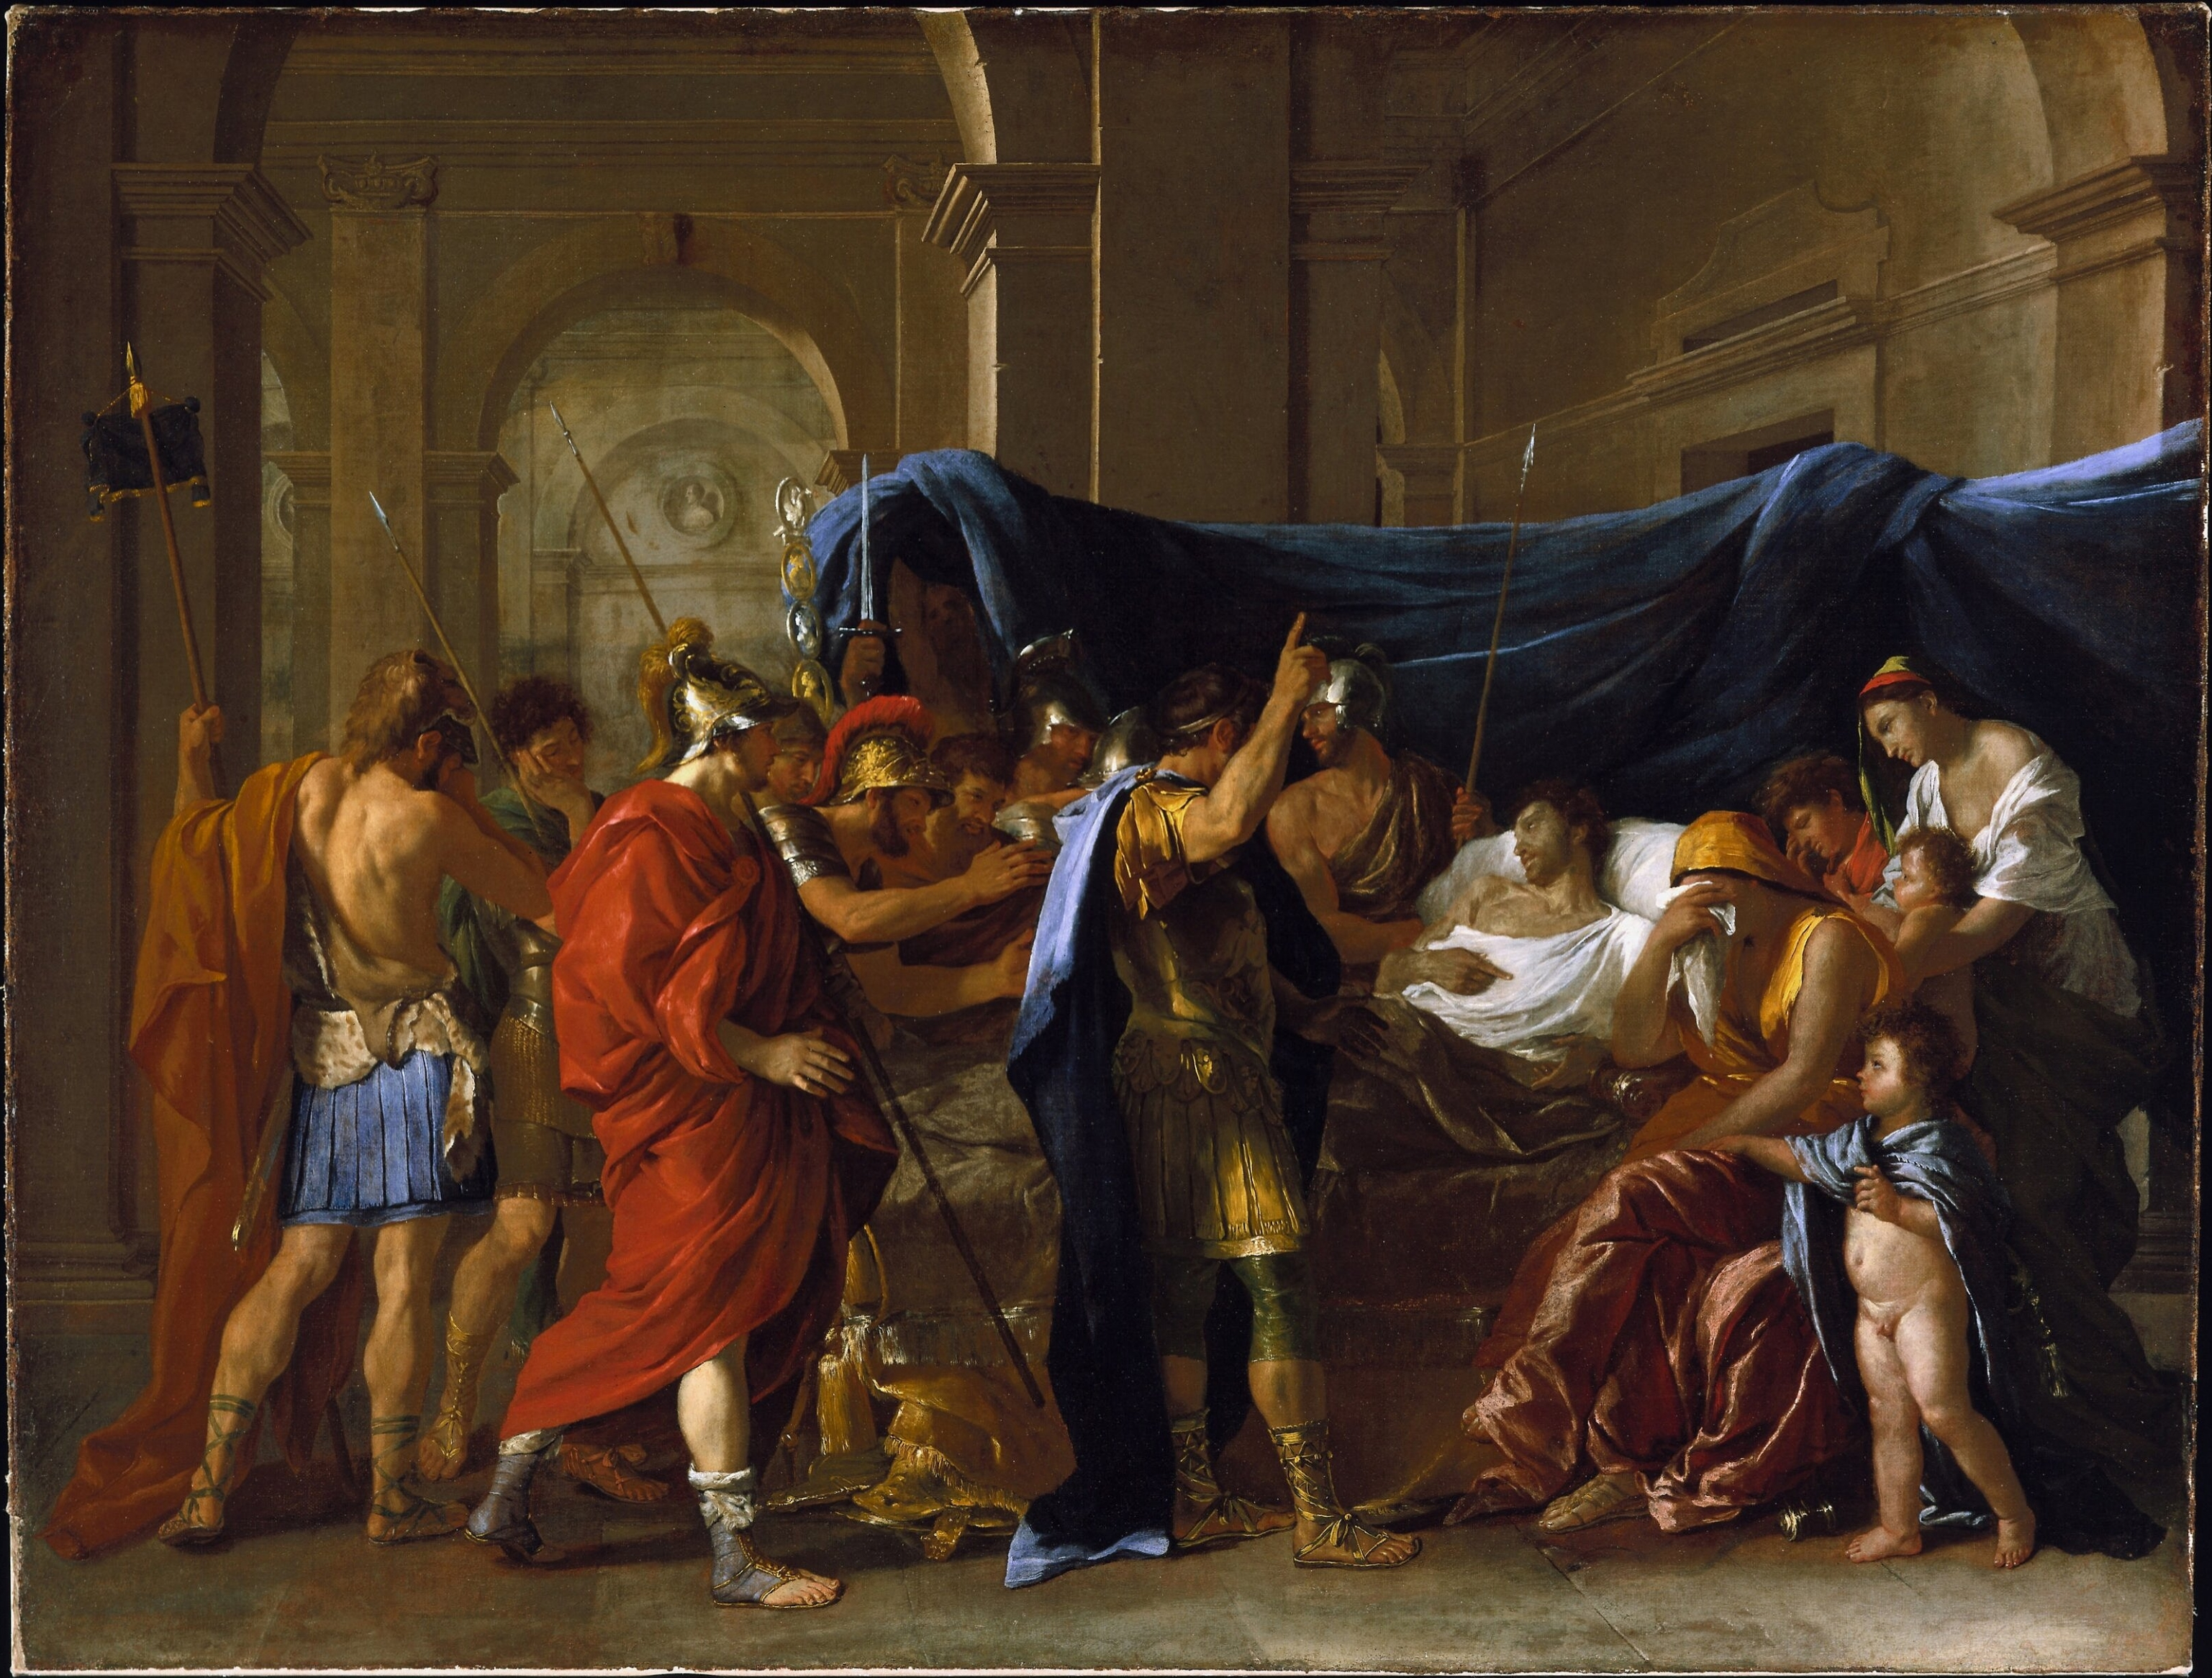 Nicolas_Poussin_-_La_Mort_de_Germanicus